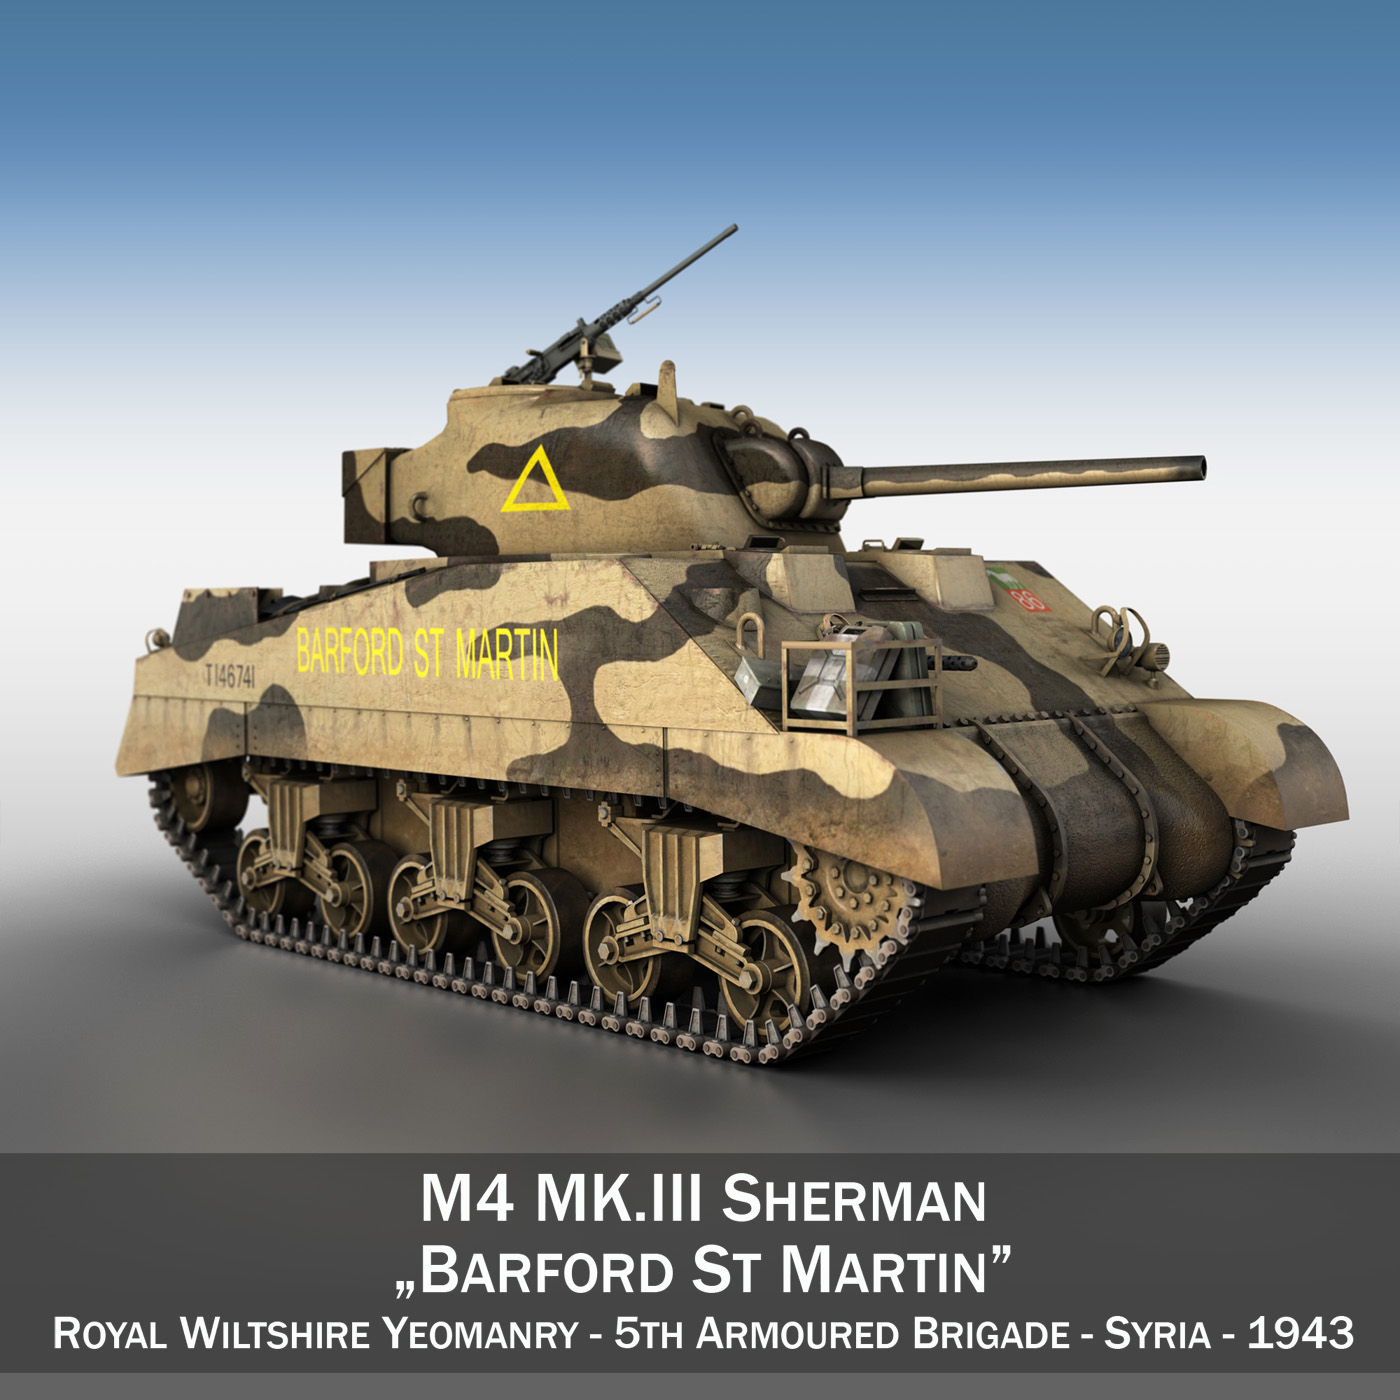 M4 Sherman MK.III - Barford St Martin 3d model  266951